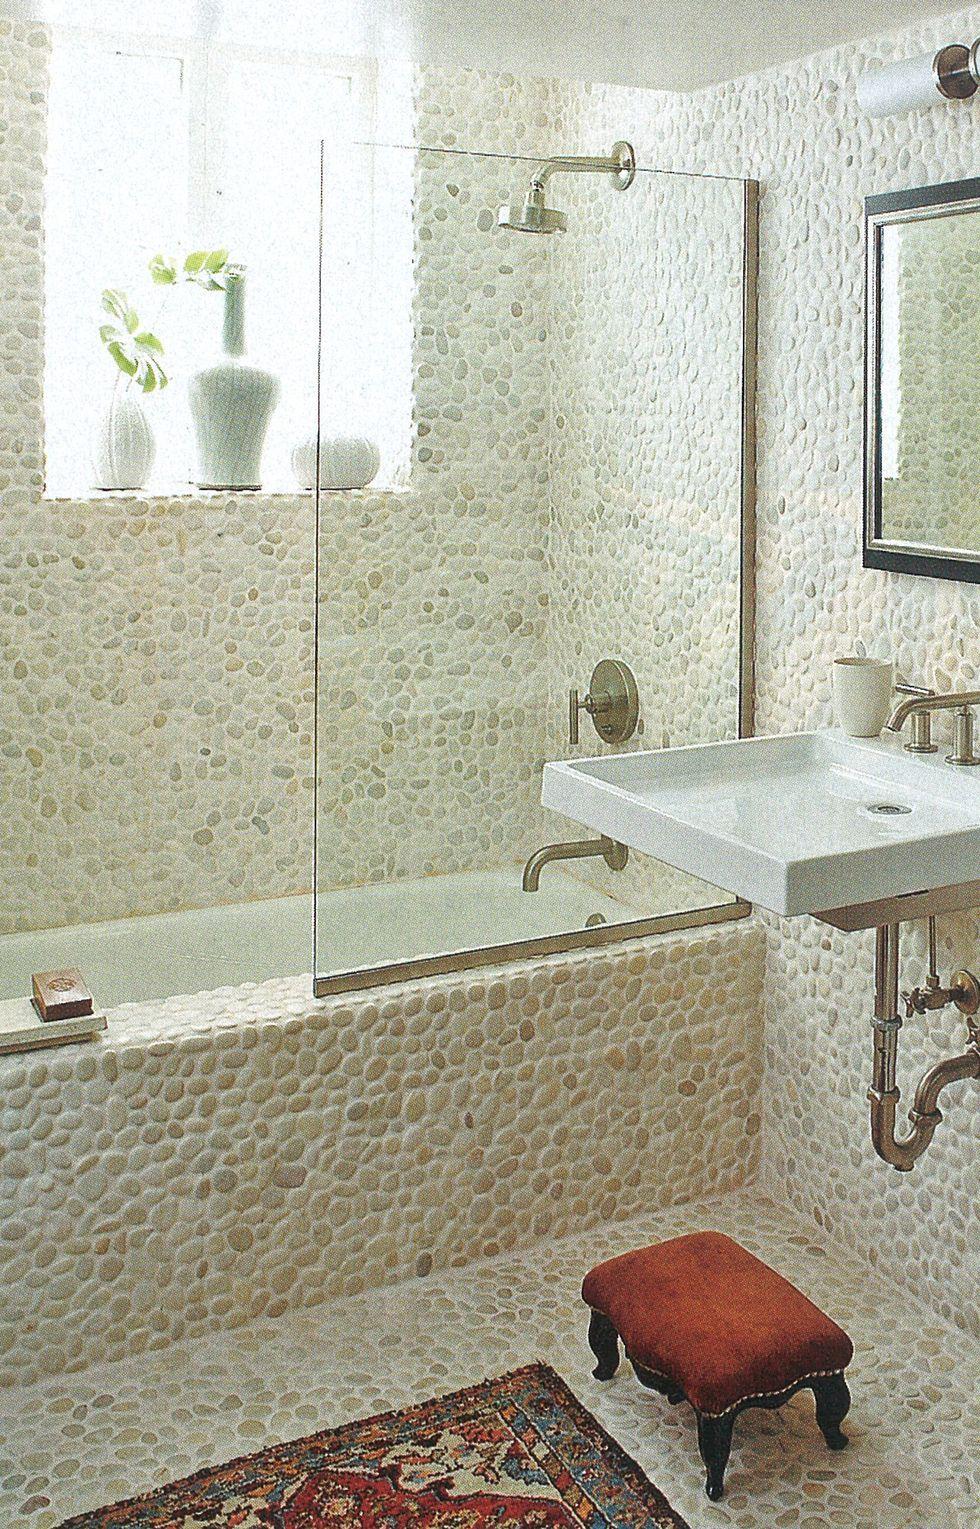 44 Best Small Bathroom Ideas - Bathroom Designs for Small ... on Bathroom Designs For Small Spaces  id=53574